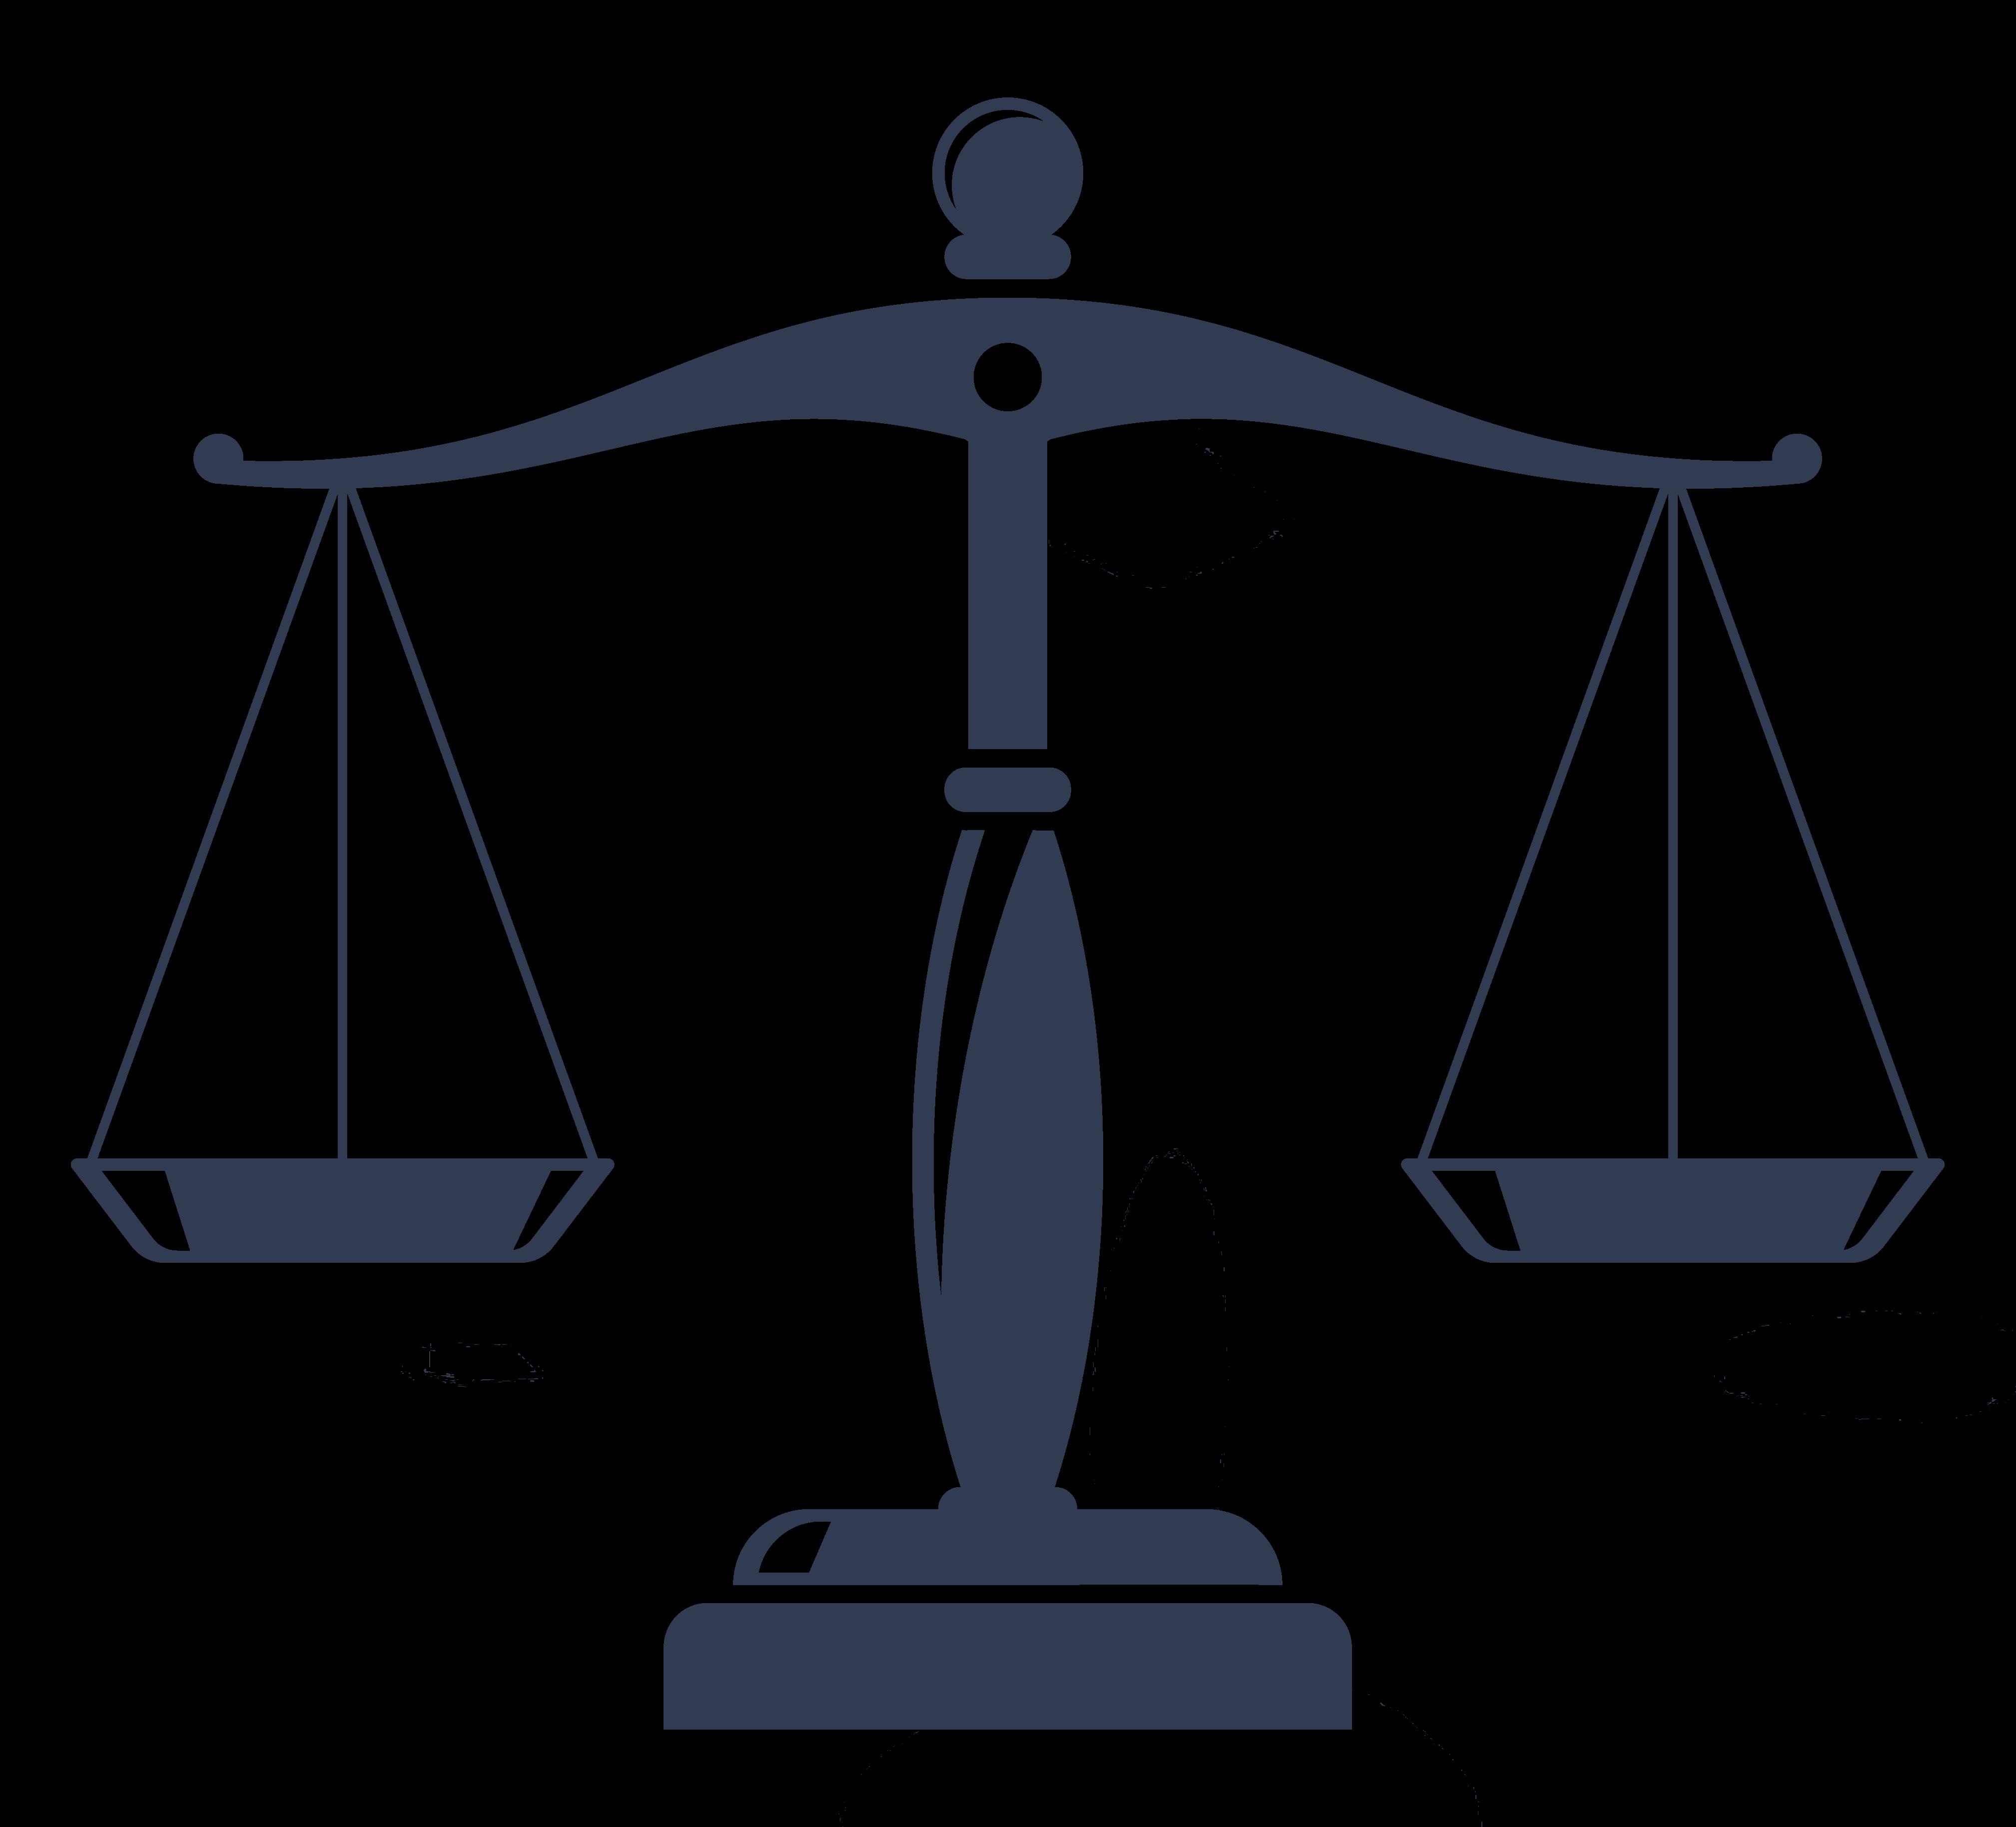 Legal clipart labour law. Soni firm has an